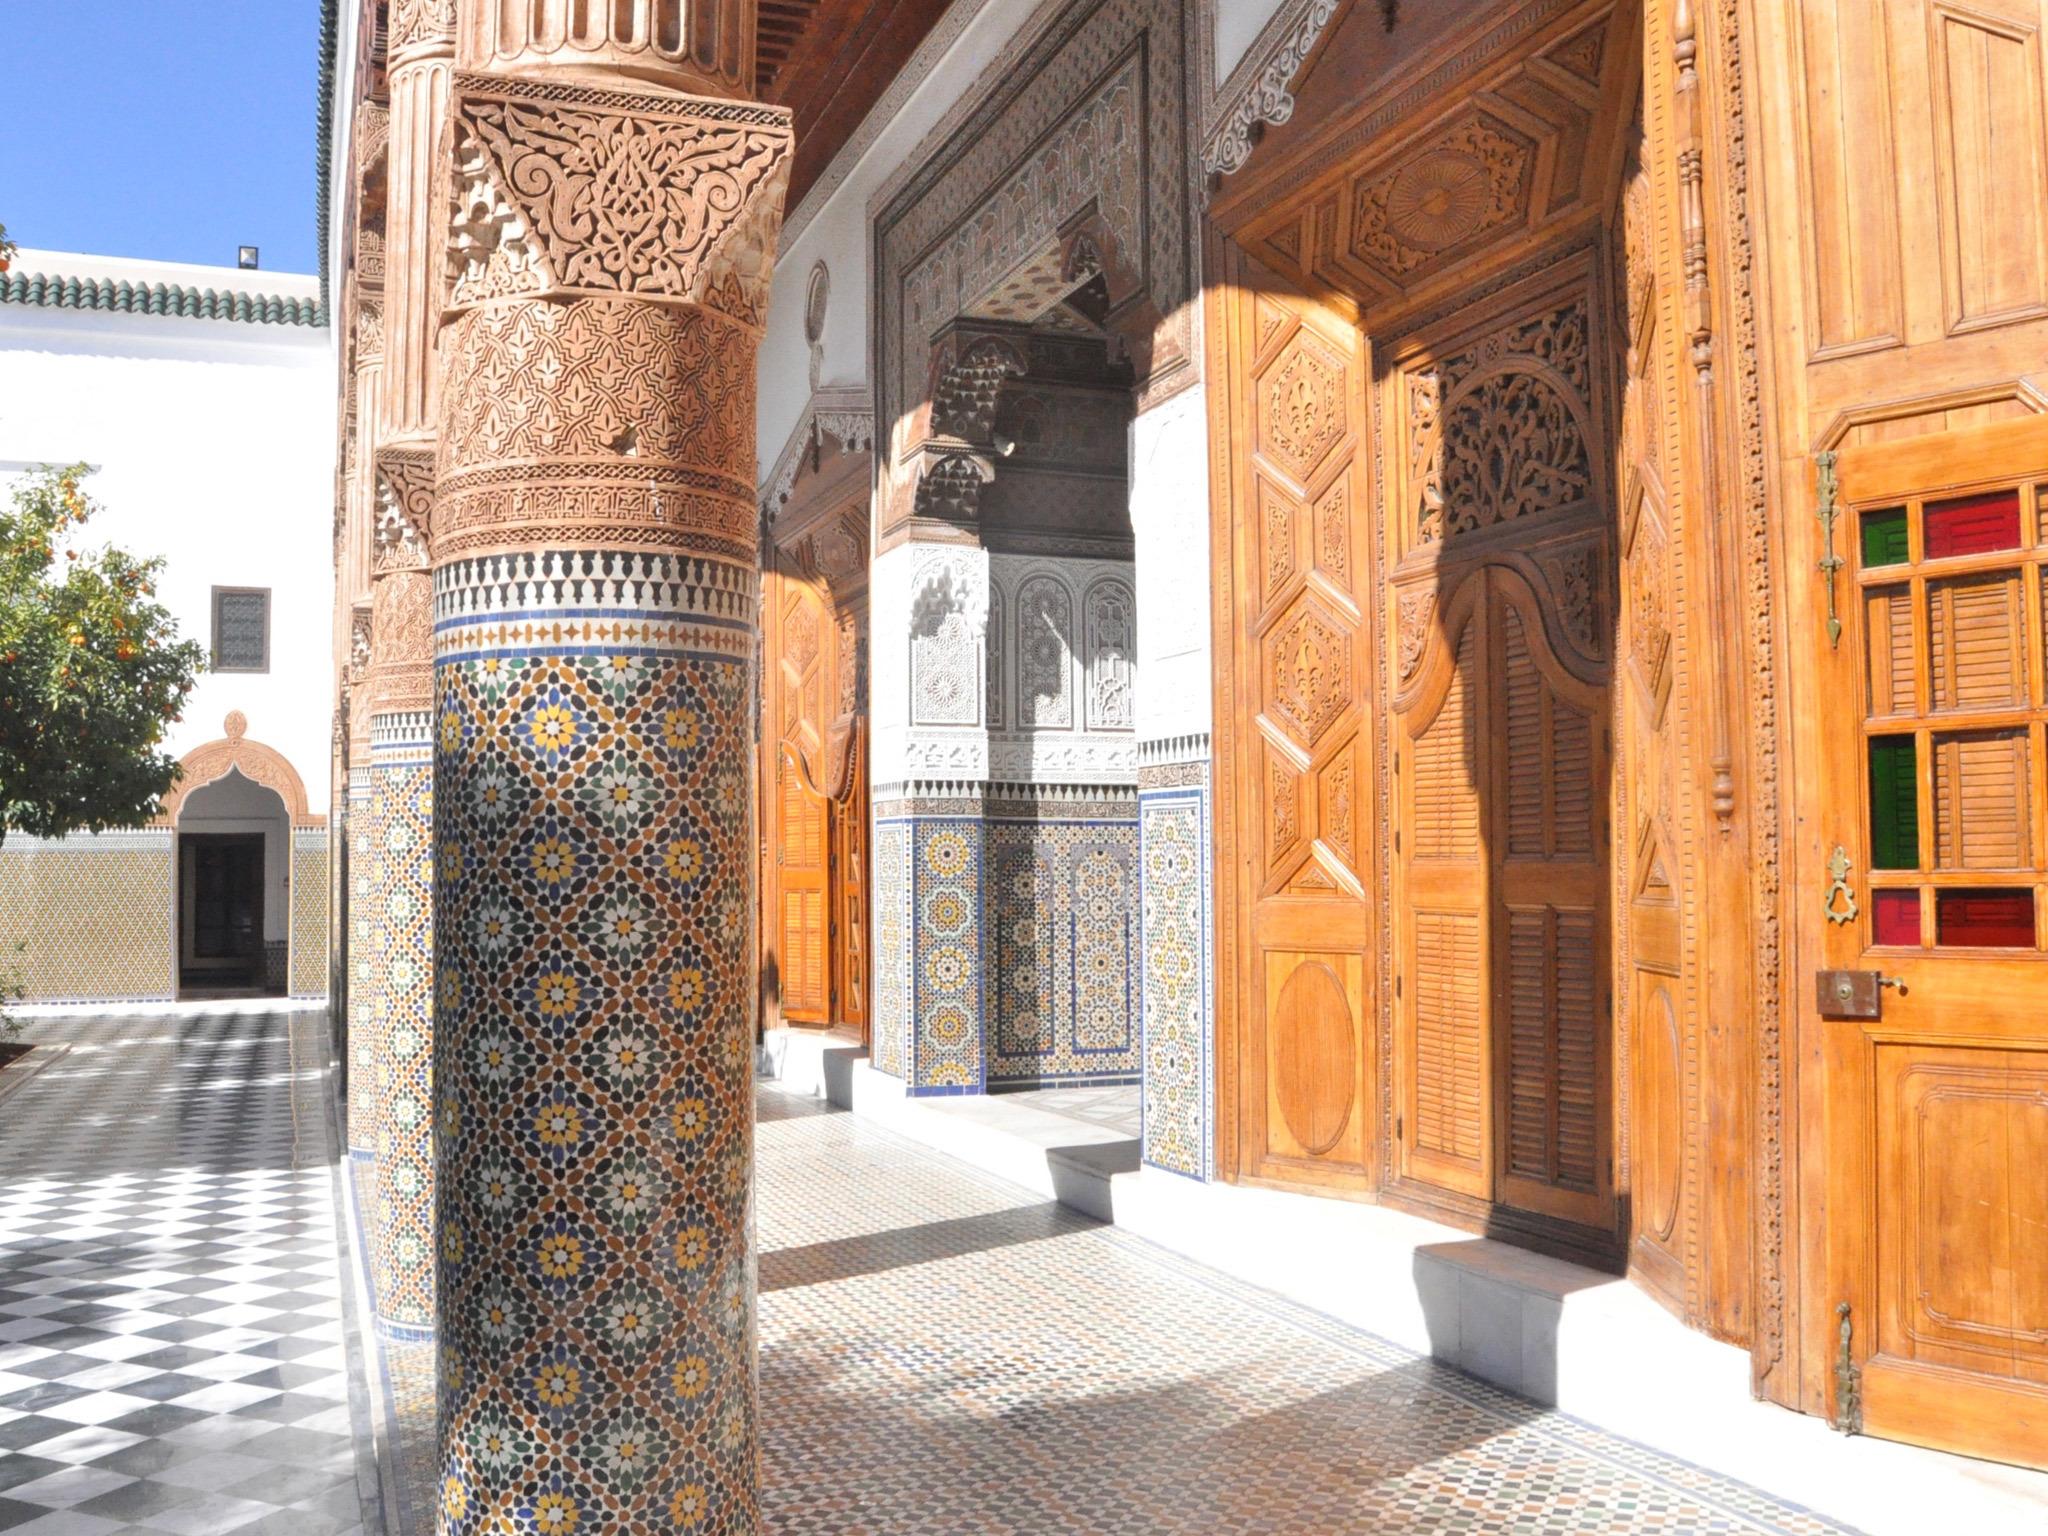 Dar el Bacha palace